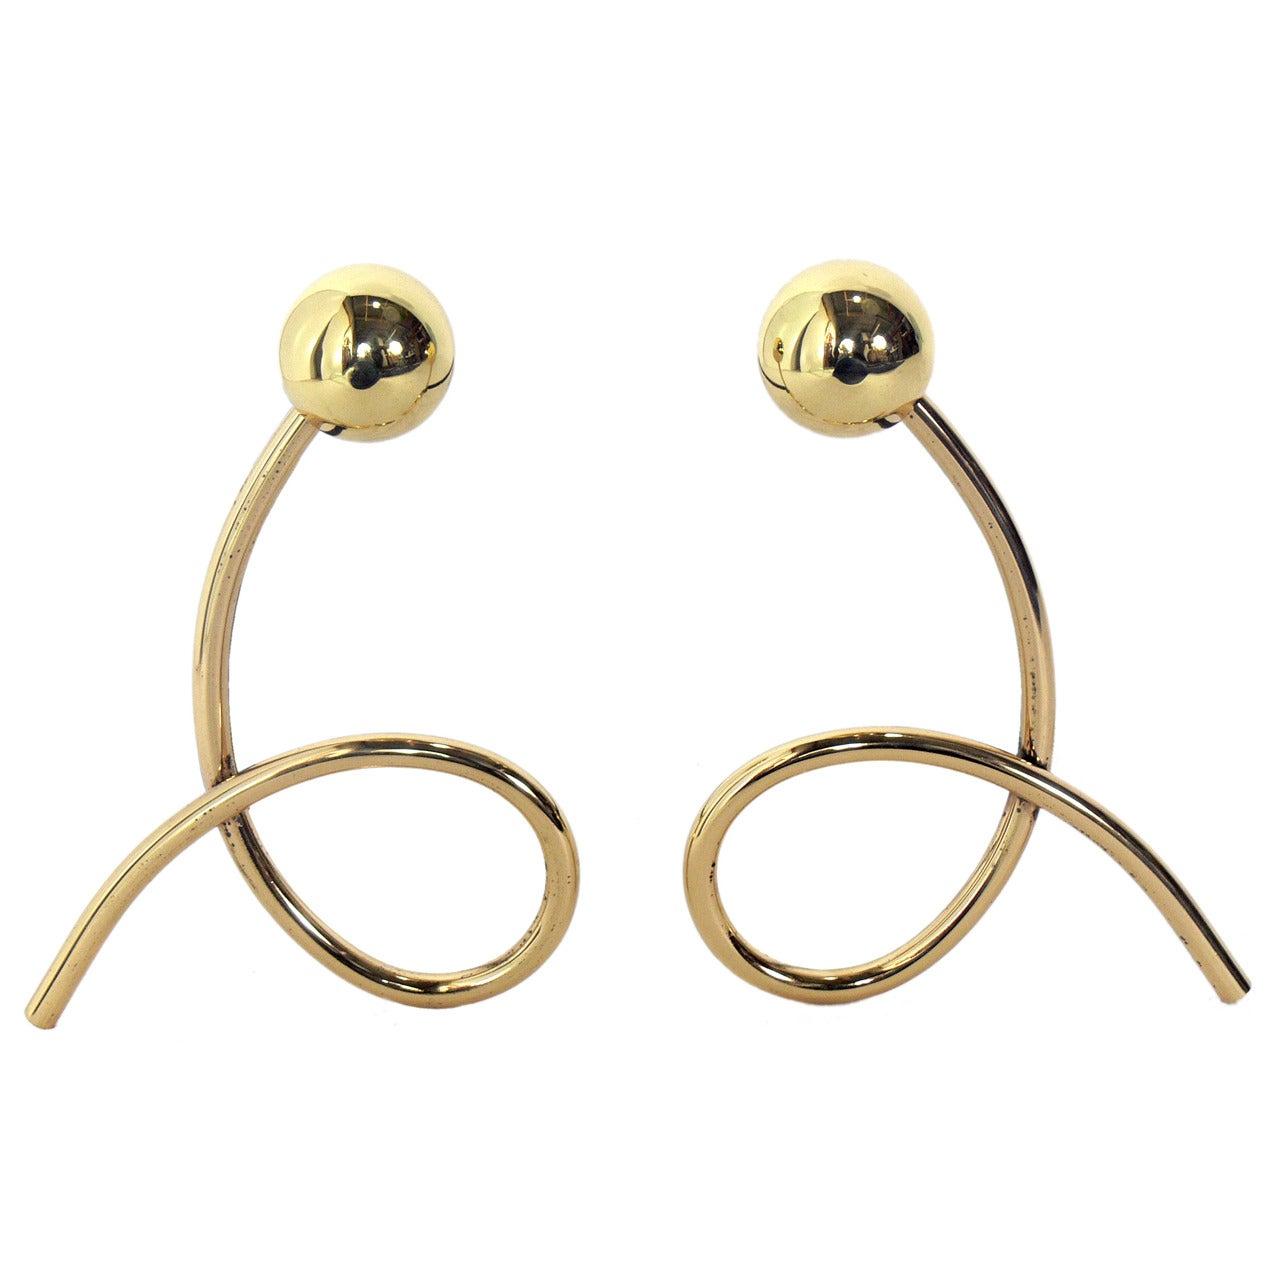 Whimsical Brass Loop Andirons